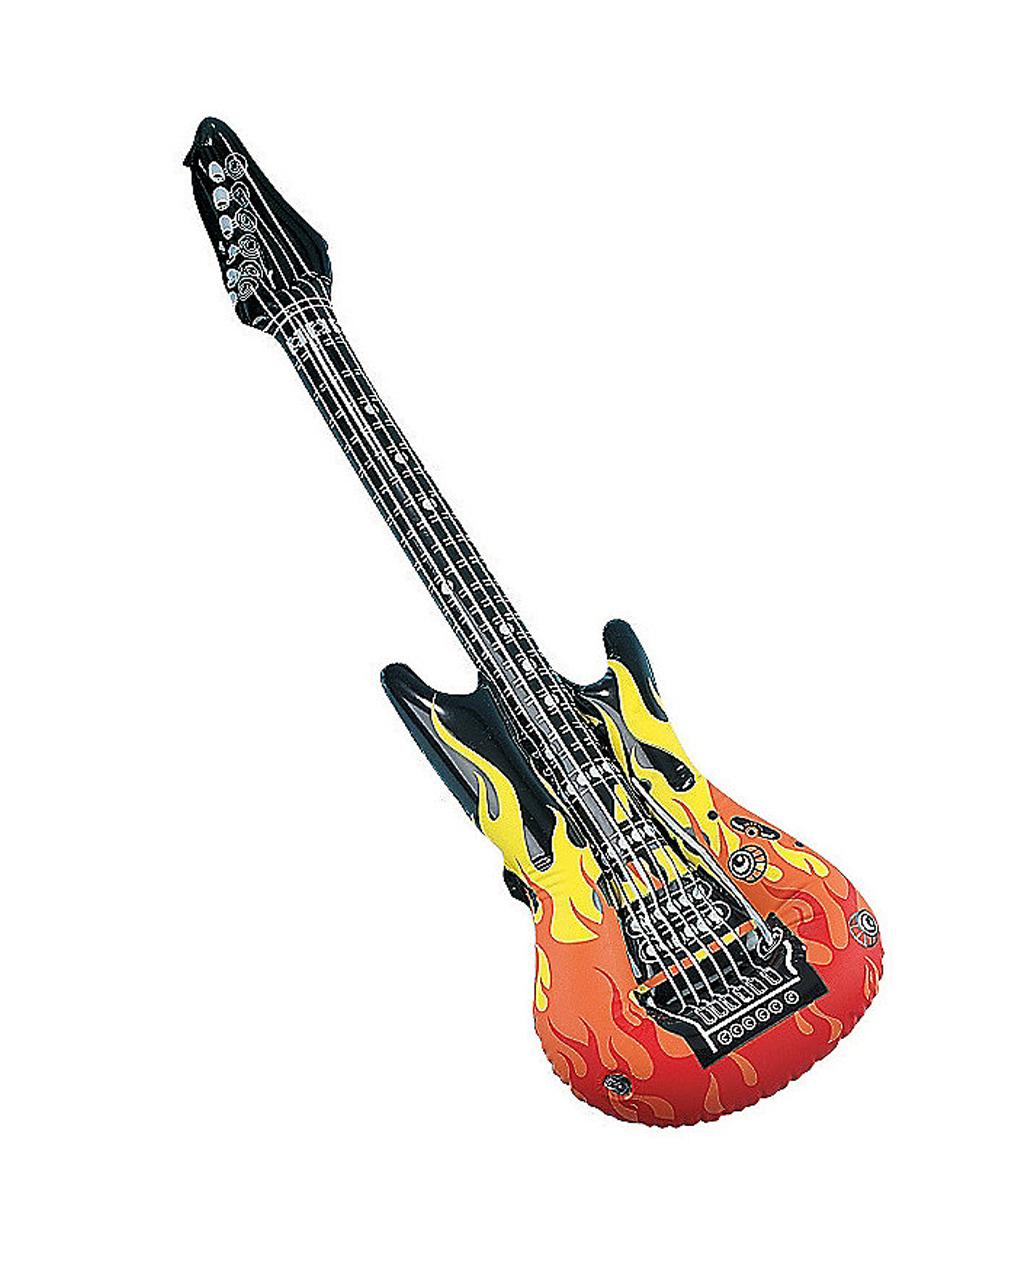 Aufblasbare Luftgitarre Luft Gitarre E Gitarre Instrument zum Aufpusten Karaoke